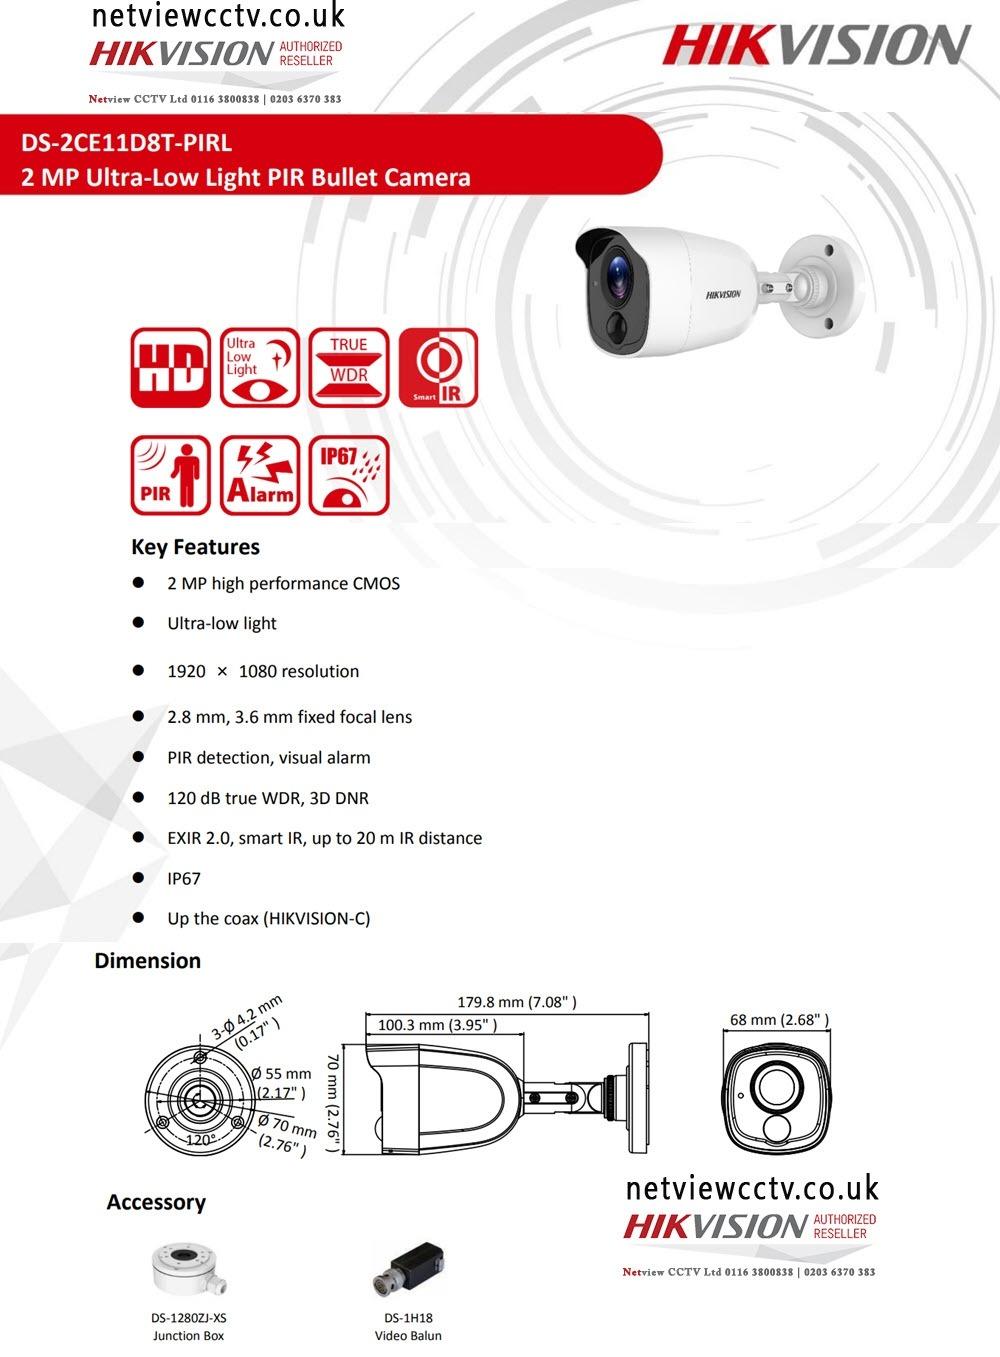 2MP DS-2CE11D8T-PIRL Hikvision 2.8mm Ultra-Low Light 103.5° PIR Bullet Camera